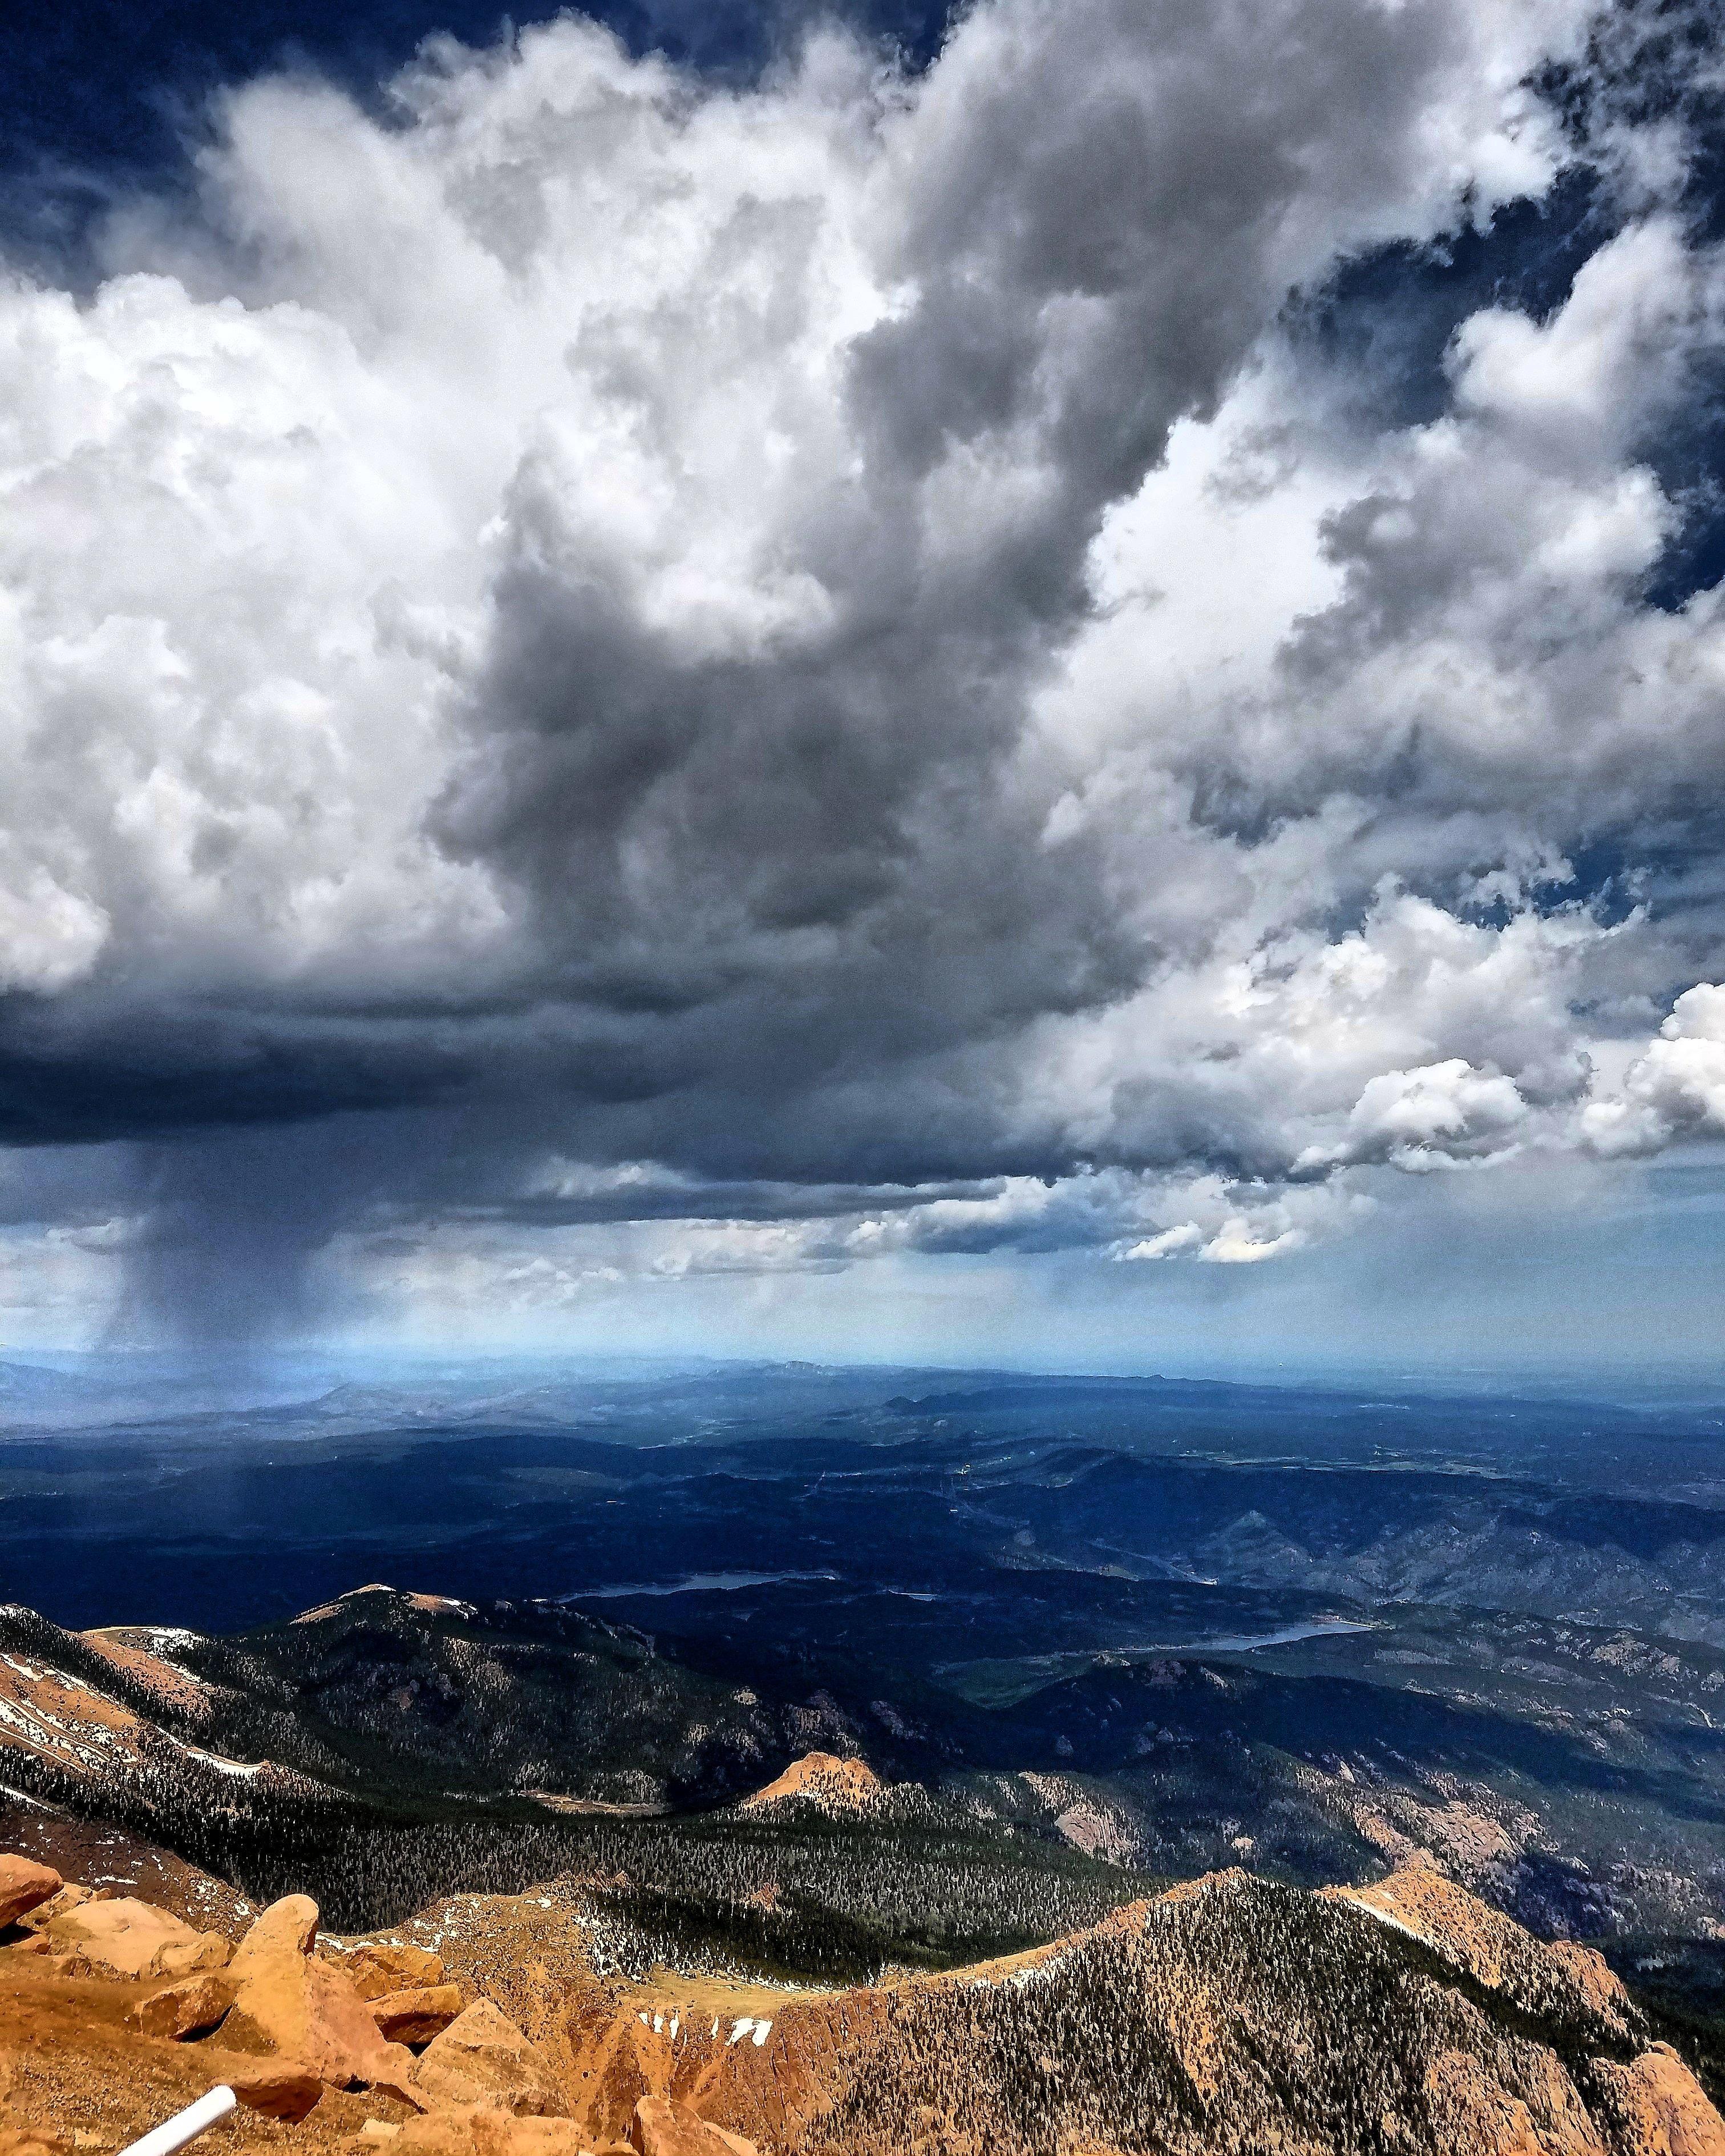 At The Top Of Pikes Peak 14115 Ft Colorado Springs Co Oc 3024x3780 Https Ift Tt 2hkg3lb Pikes Peak Landscape Photographers Colorado